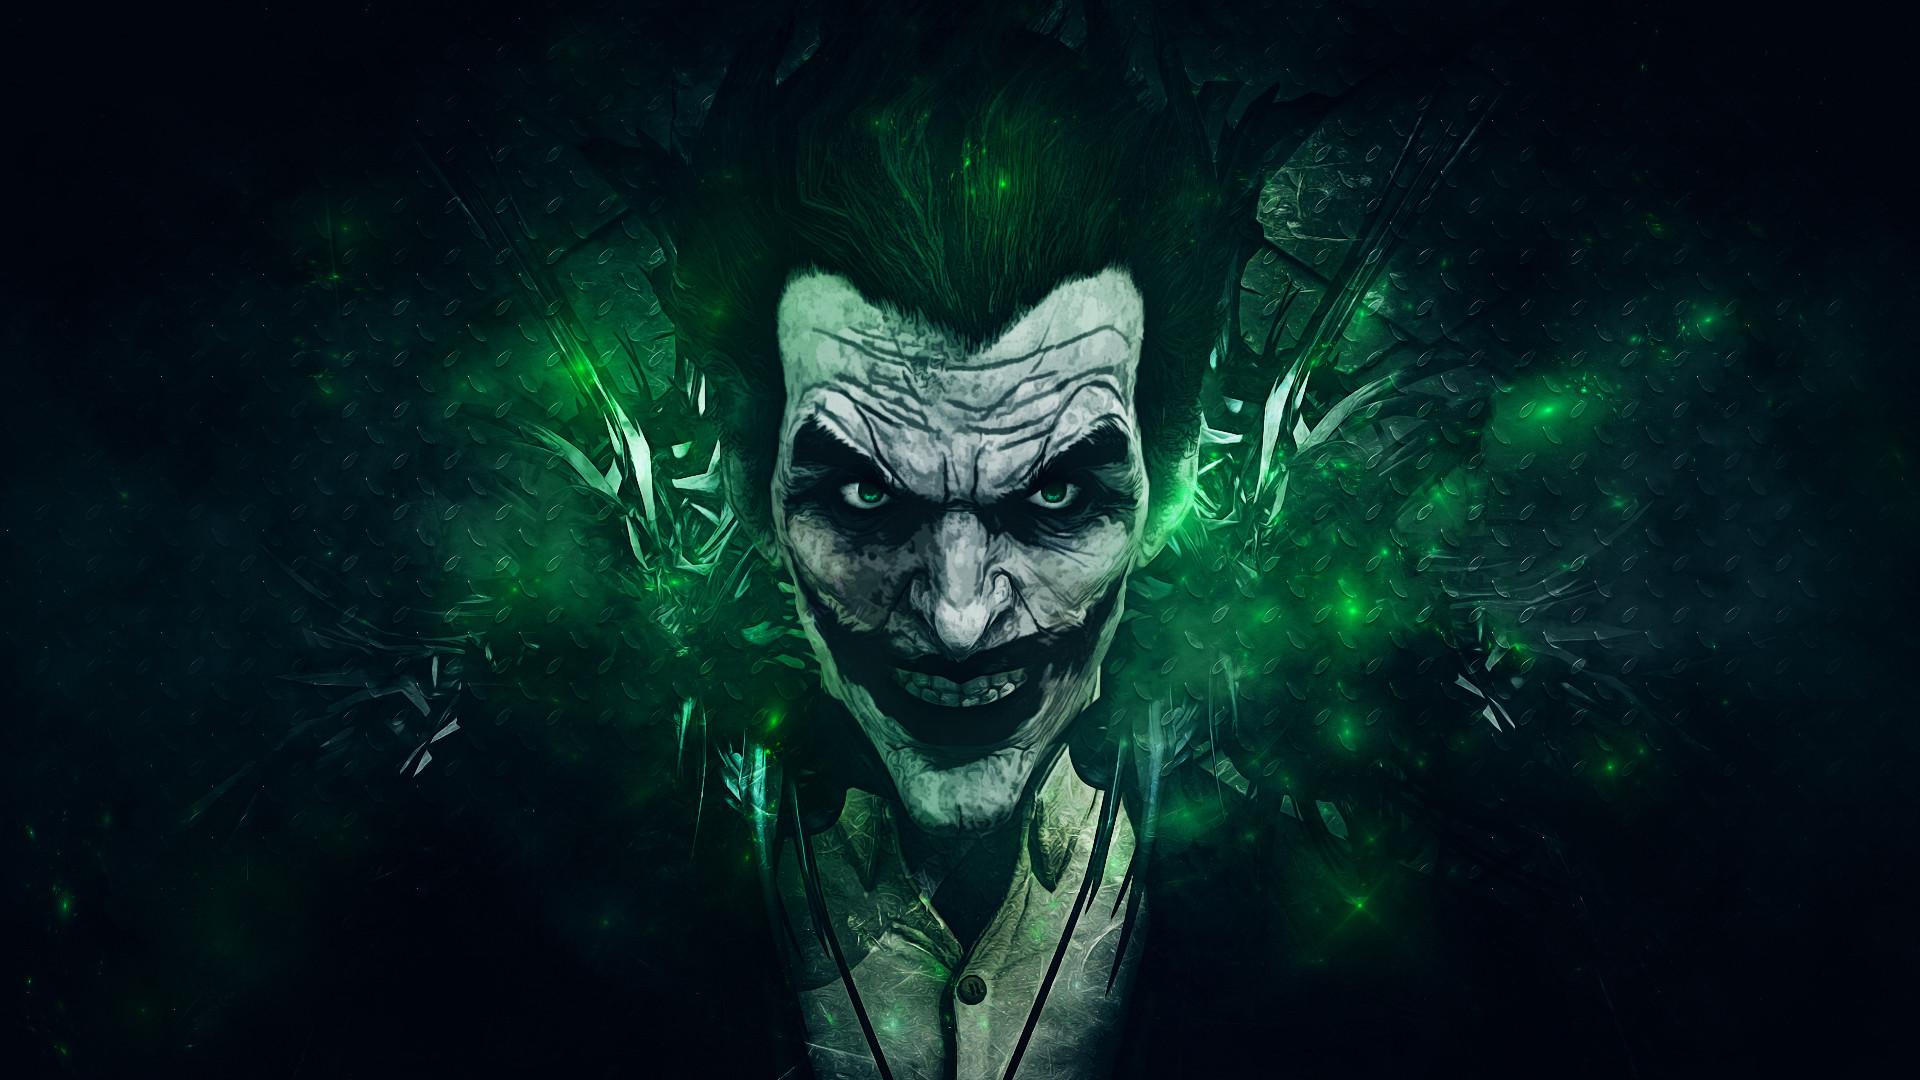 Batman And Joker Wallpaper 85 Images